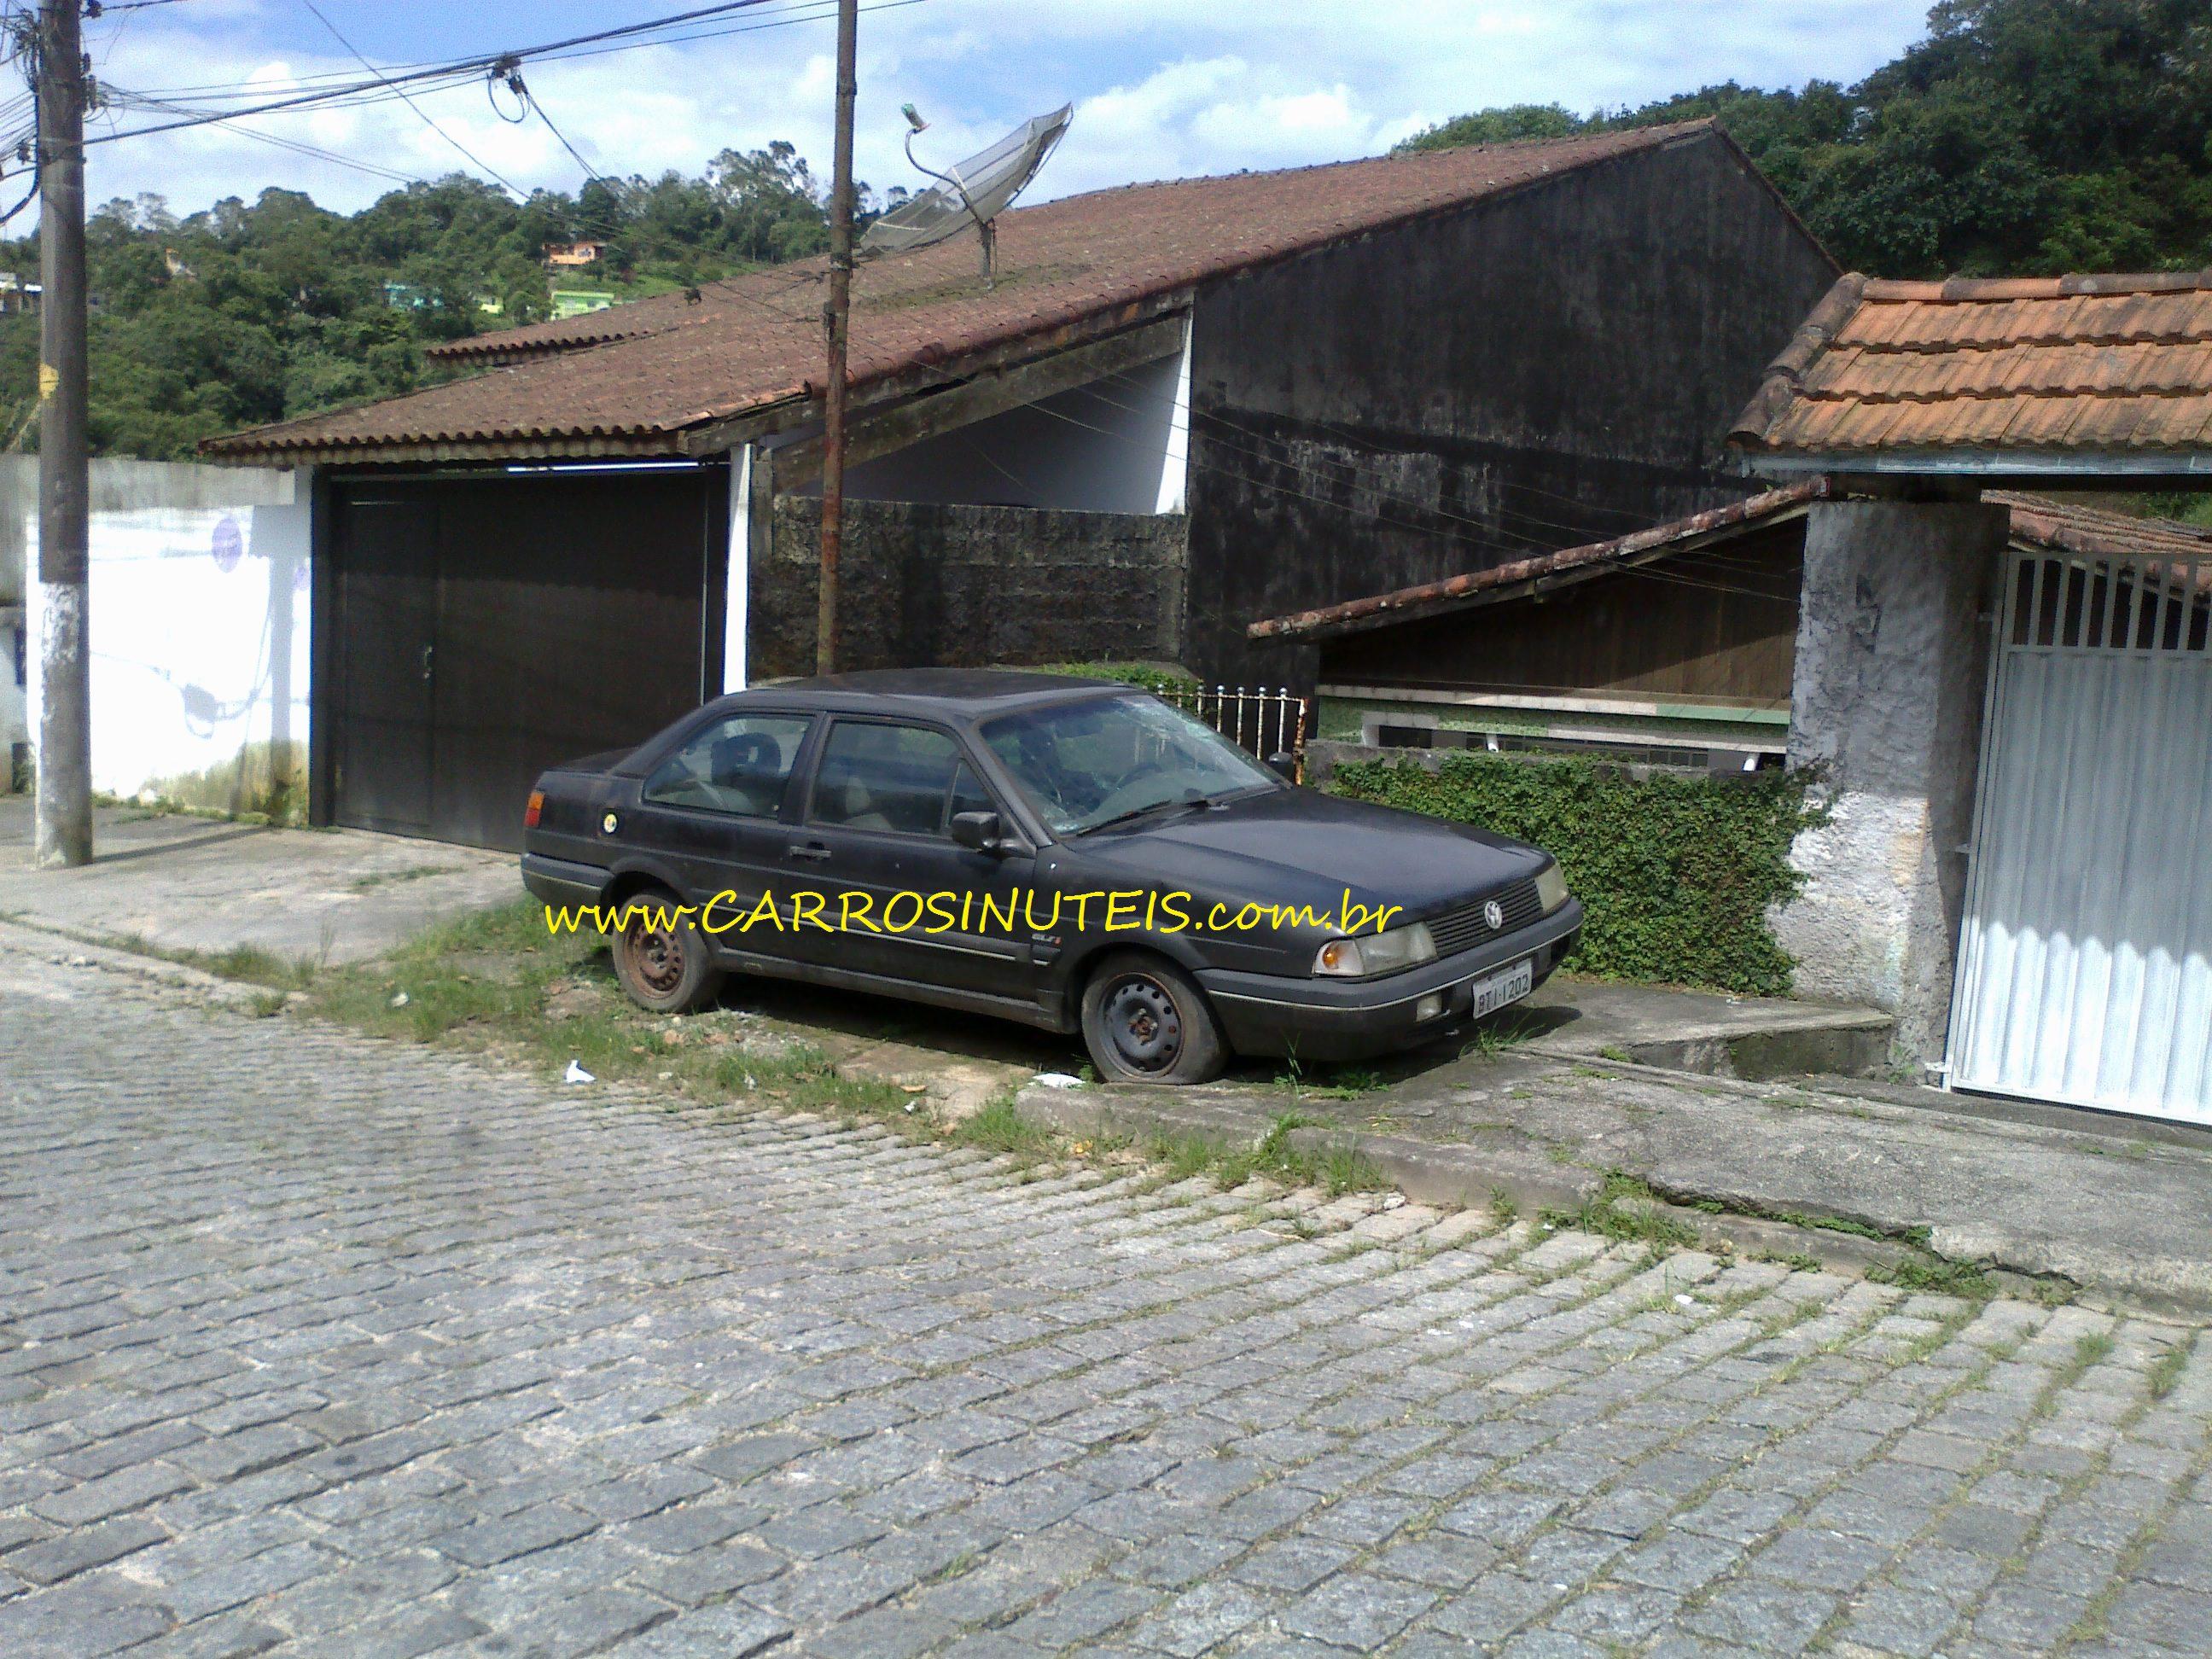 17012013343 VW Santana, Ribeirão Pires, SP. Foto de Giovani Valentin.